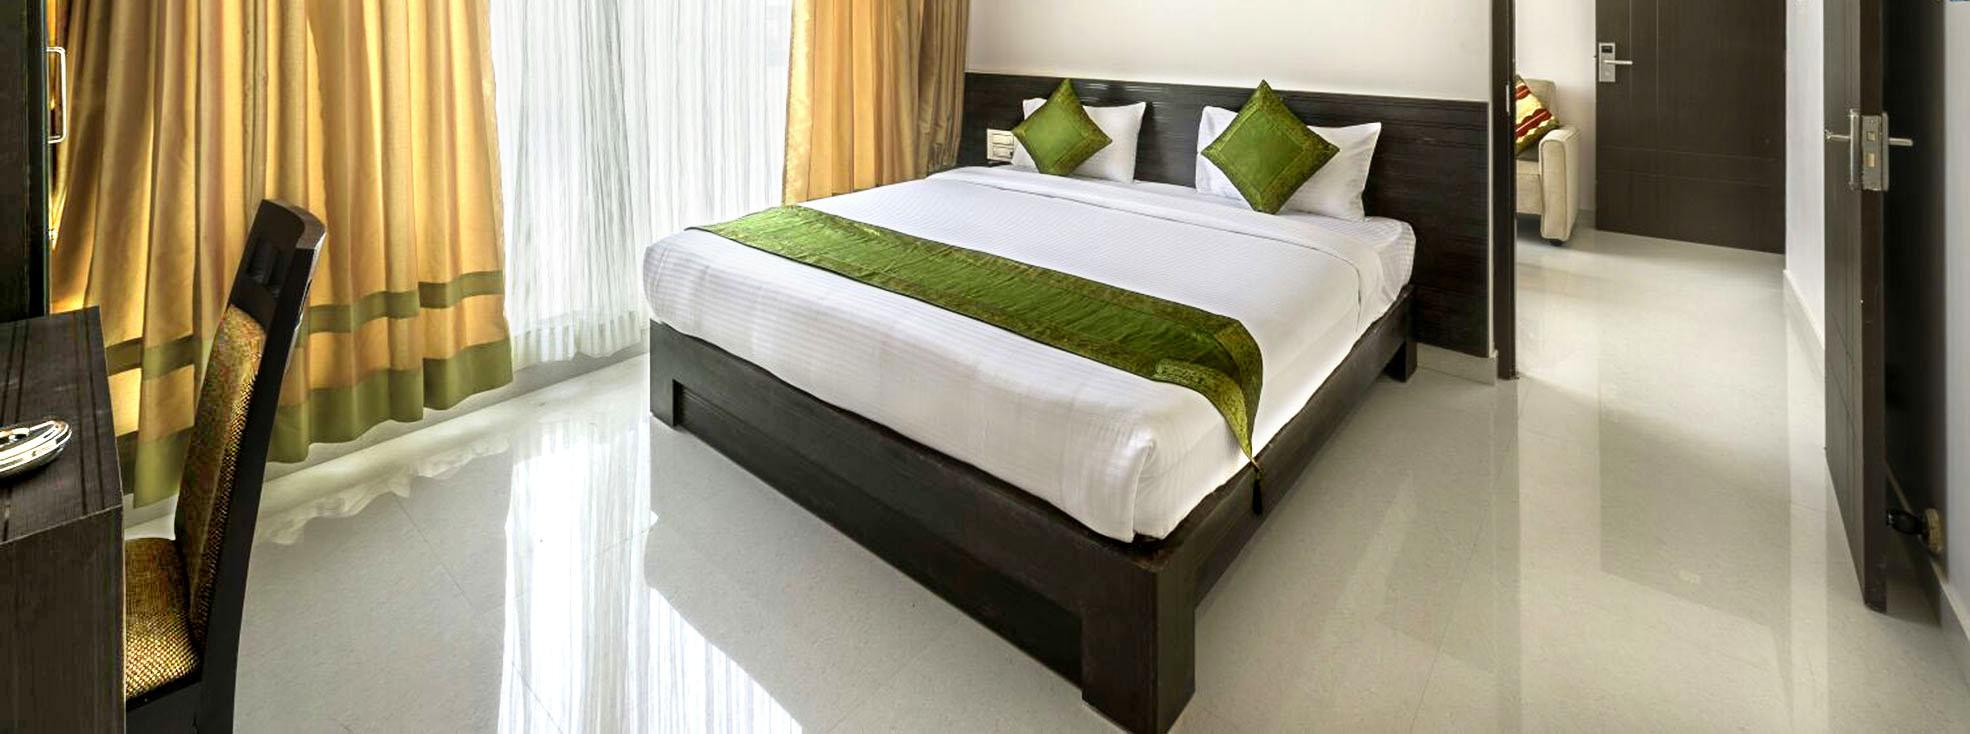 https://www.ogabnb.com/images/hotels/bmyritajmi676bizdxnq.jpg